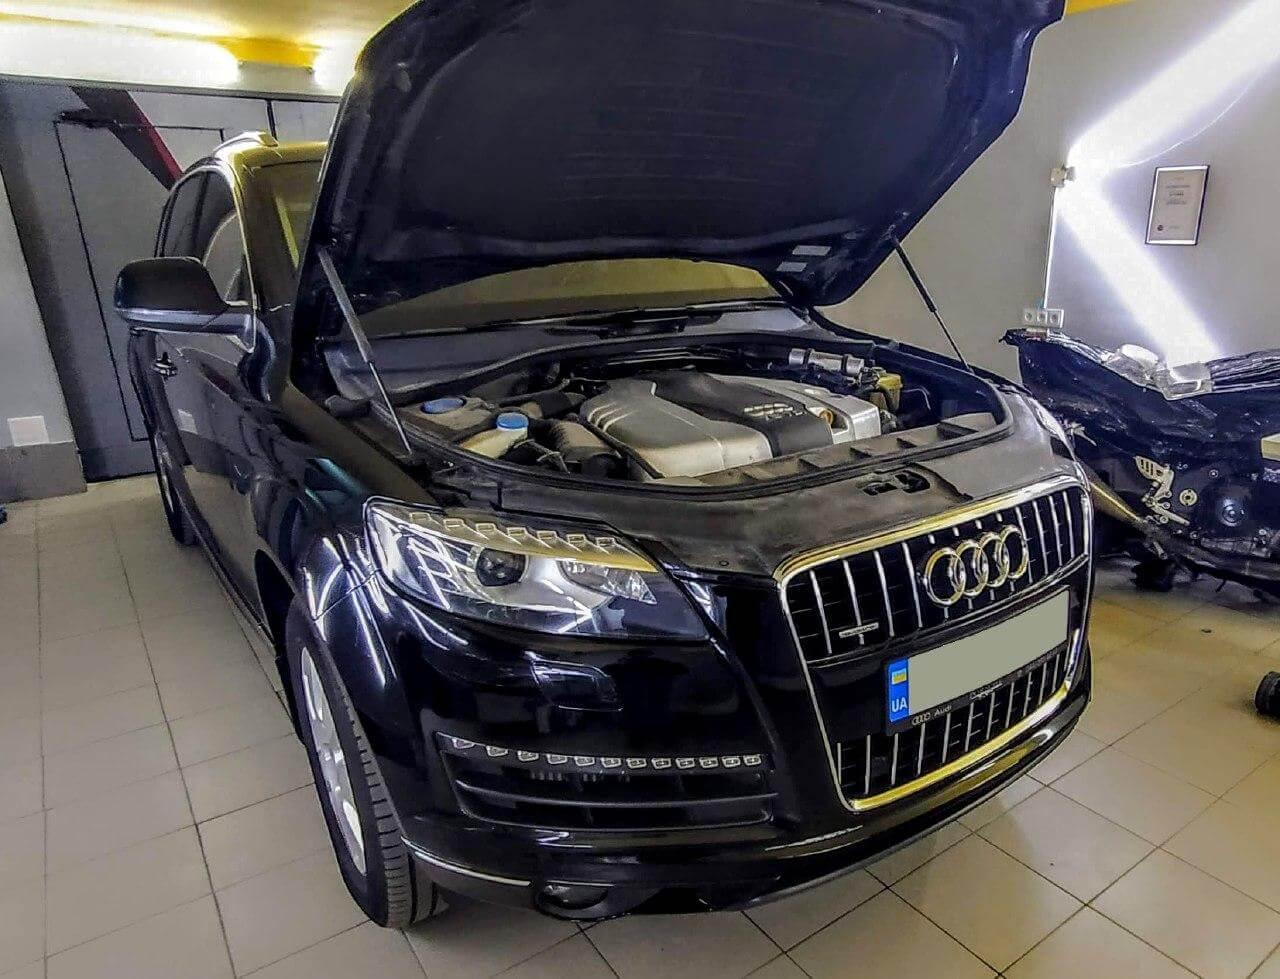 Полировка и шлифовка фар Audi Q7 2010 г.в.